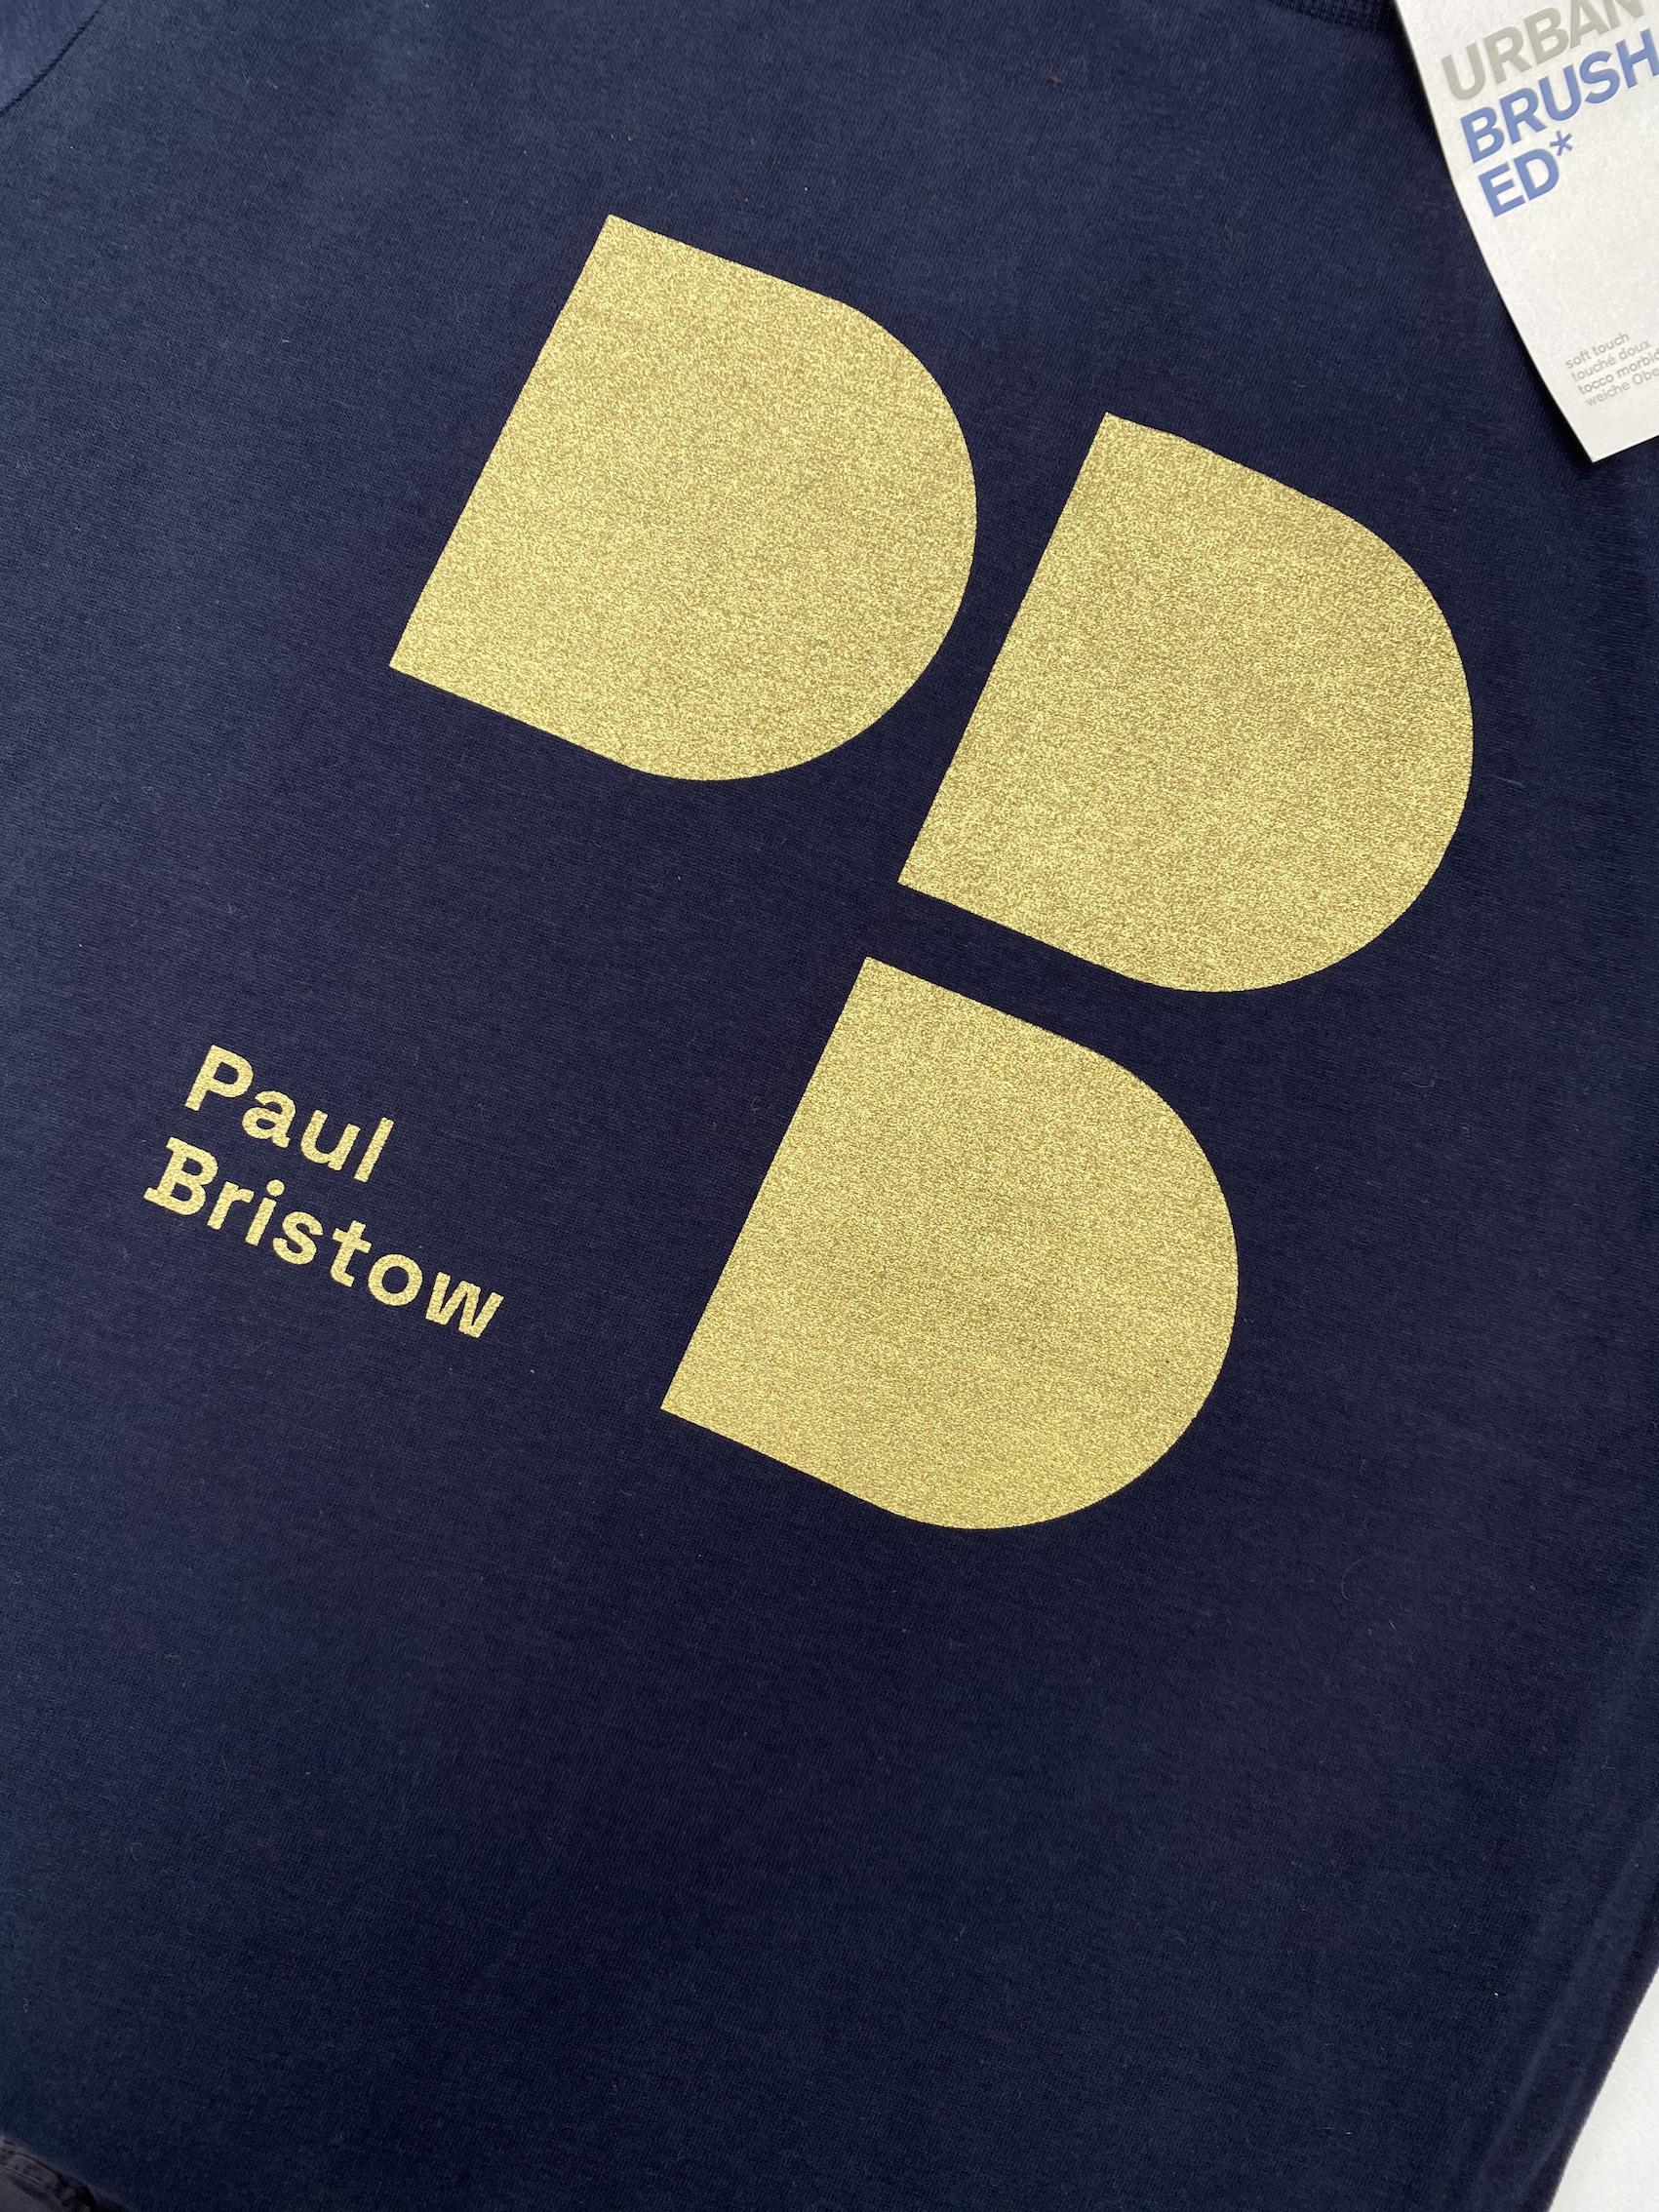 Paul Bristow logo on printed t-shirts in gold metallic ink